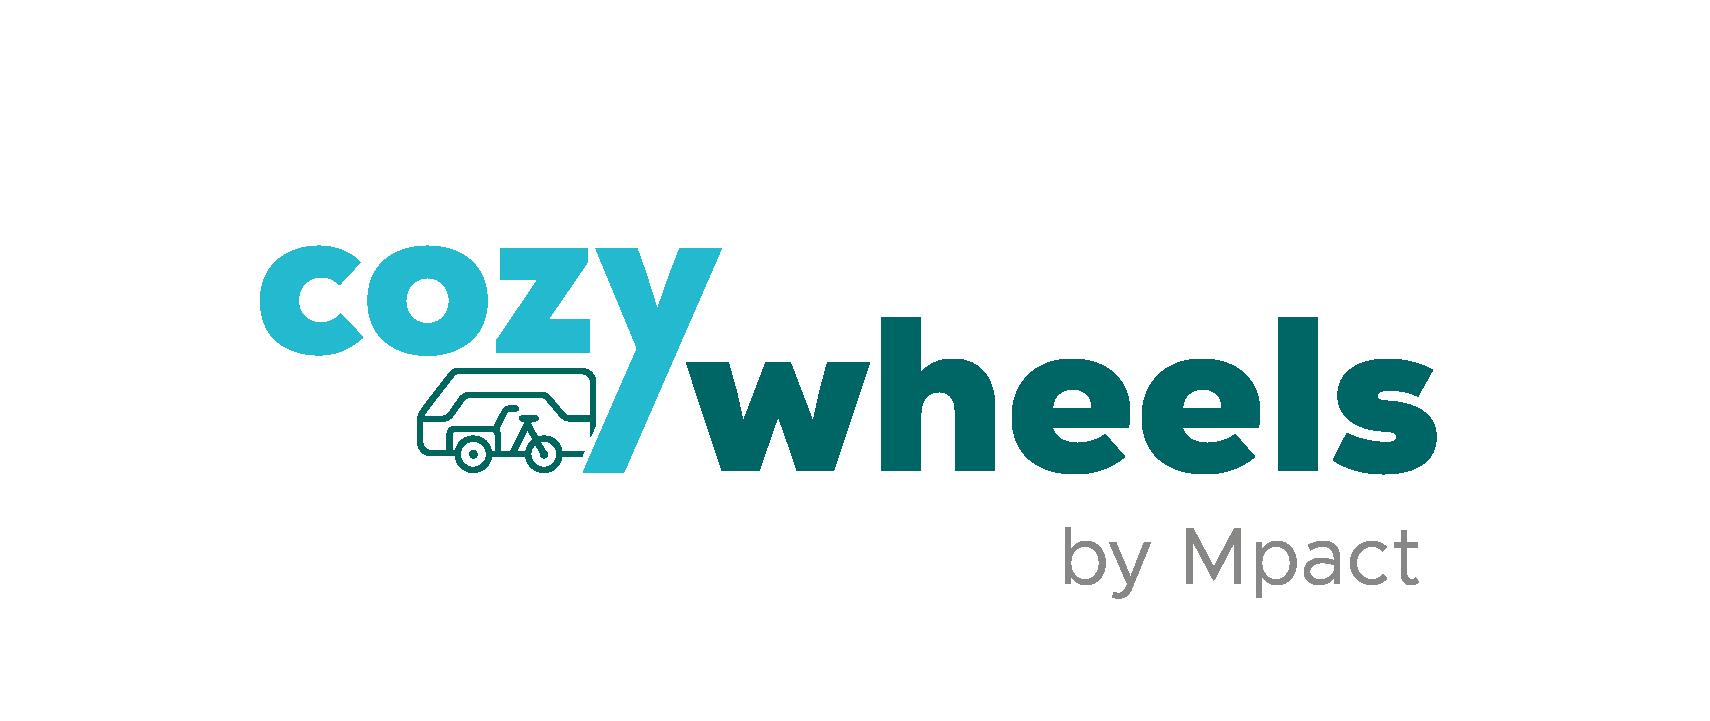 Cozywheels